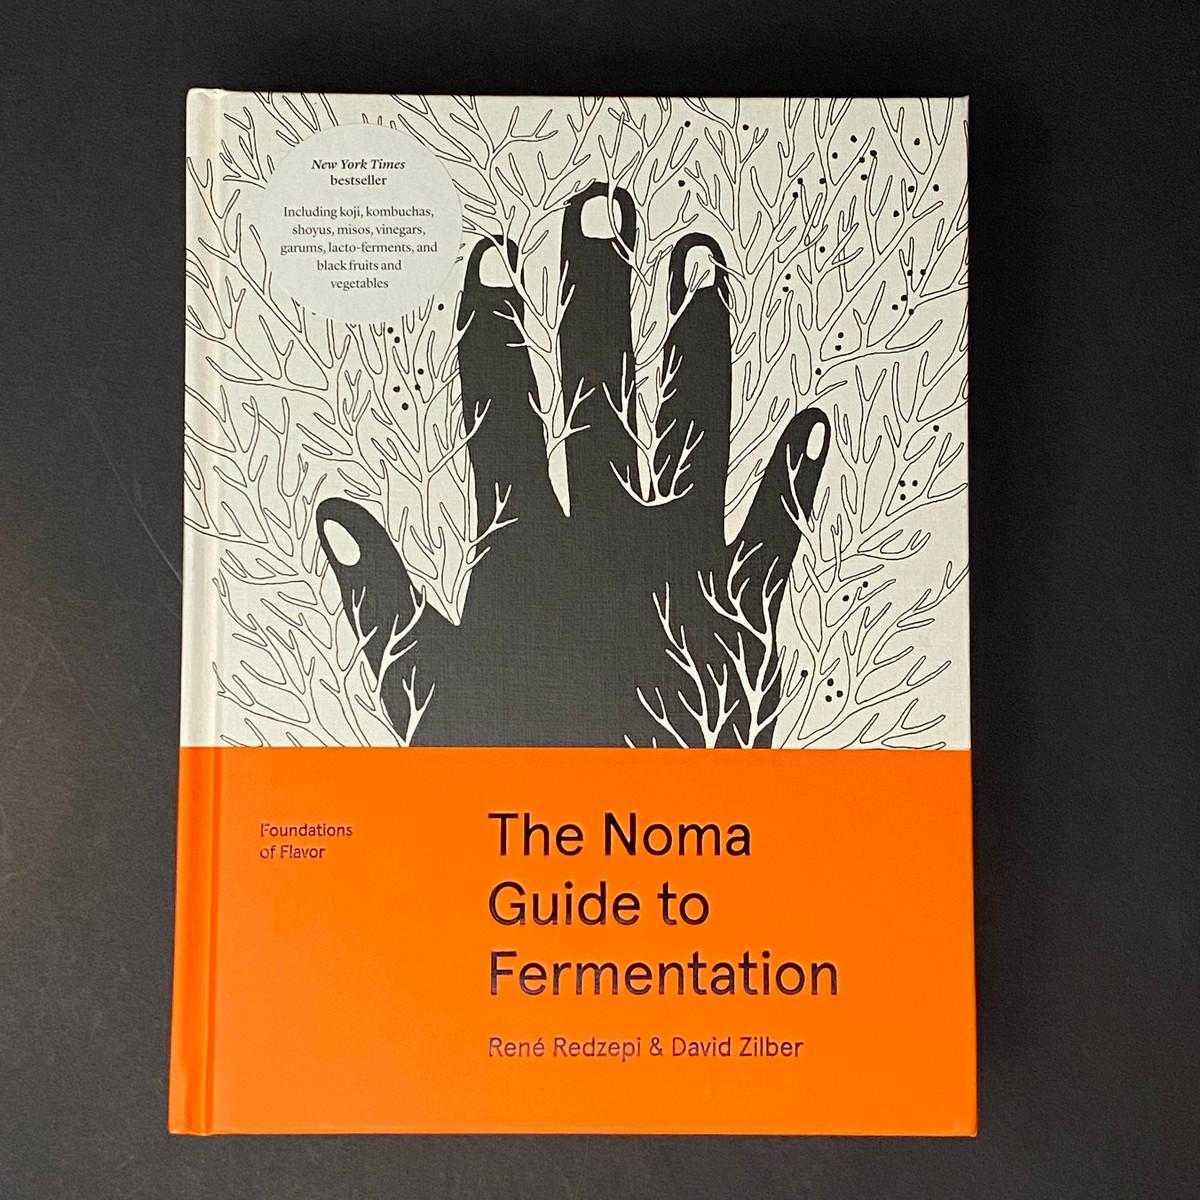 The Noma Guide to Fermentation | Rene Redzepi